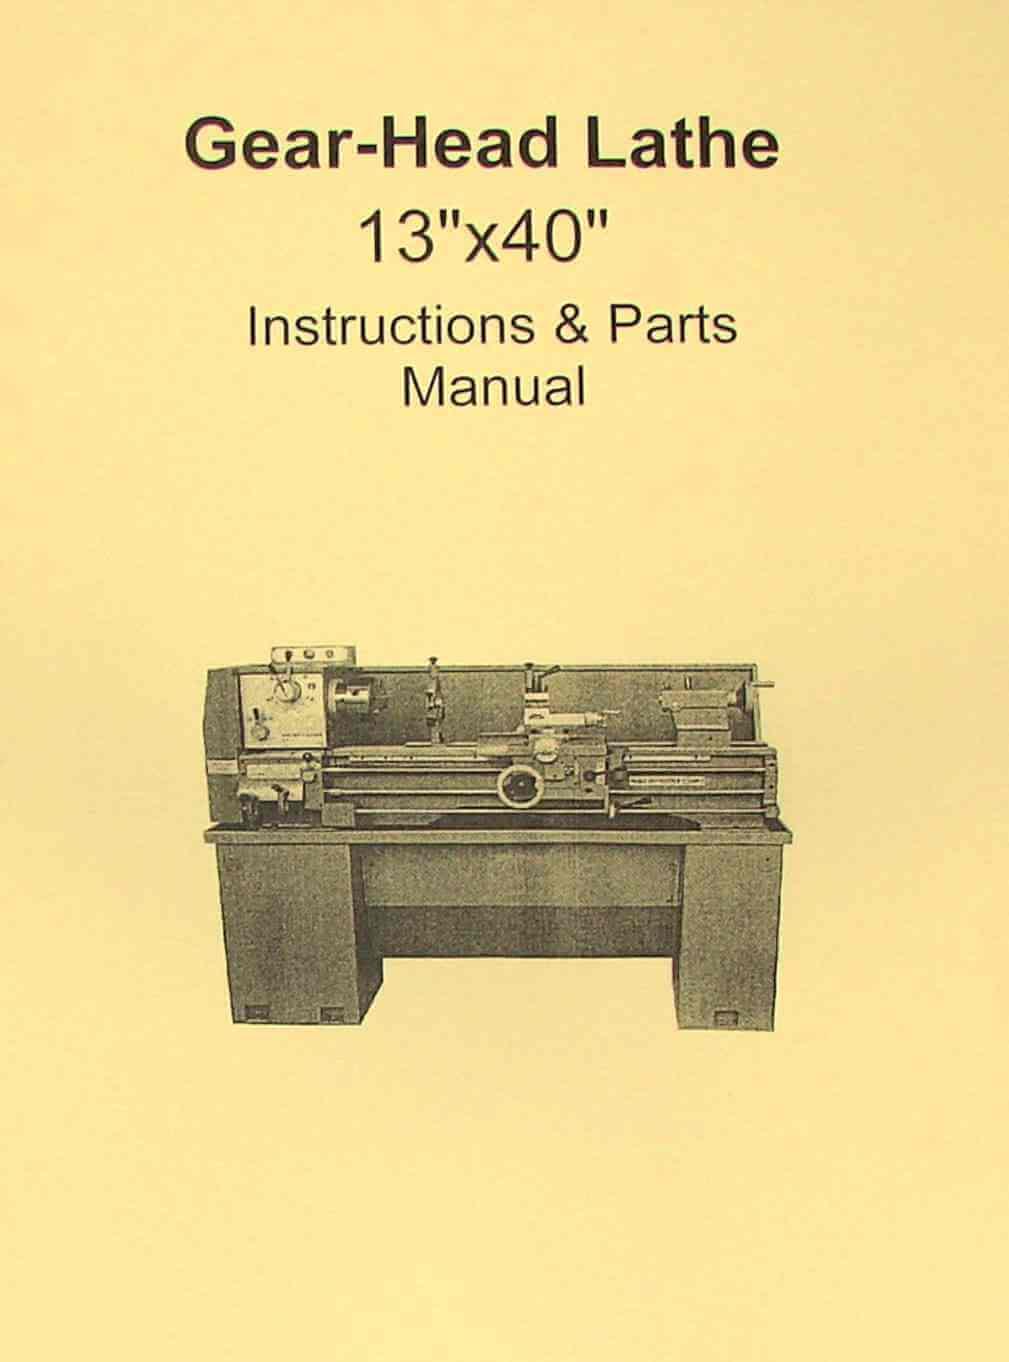 Complete Free List Catalogs